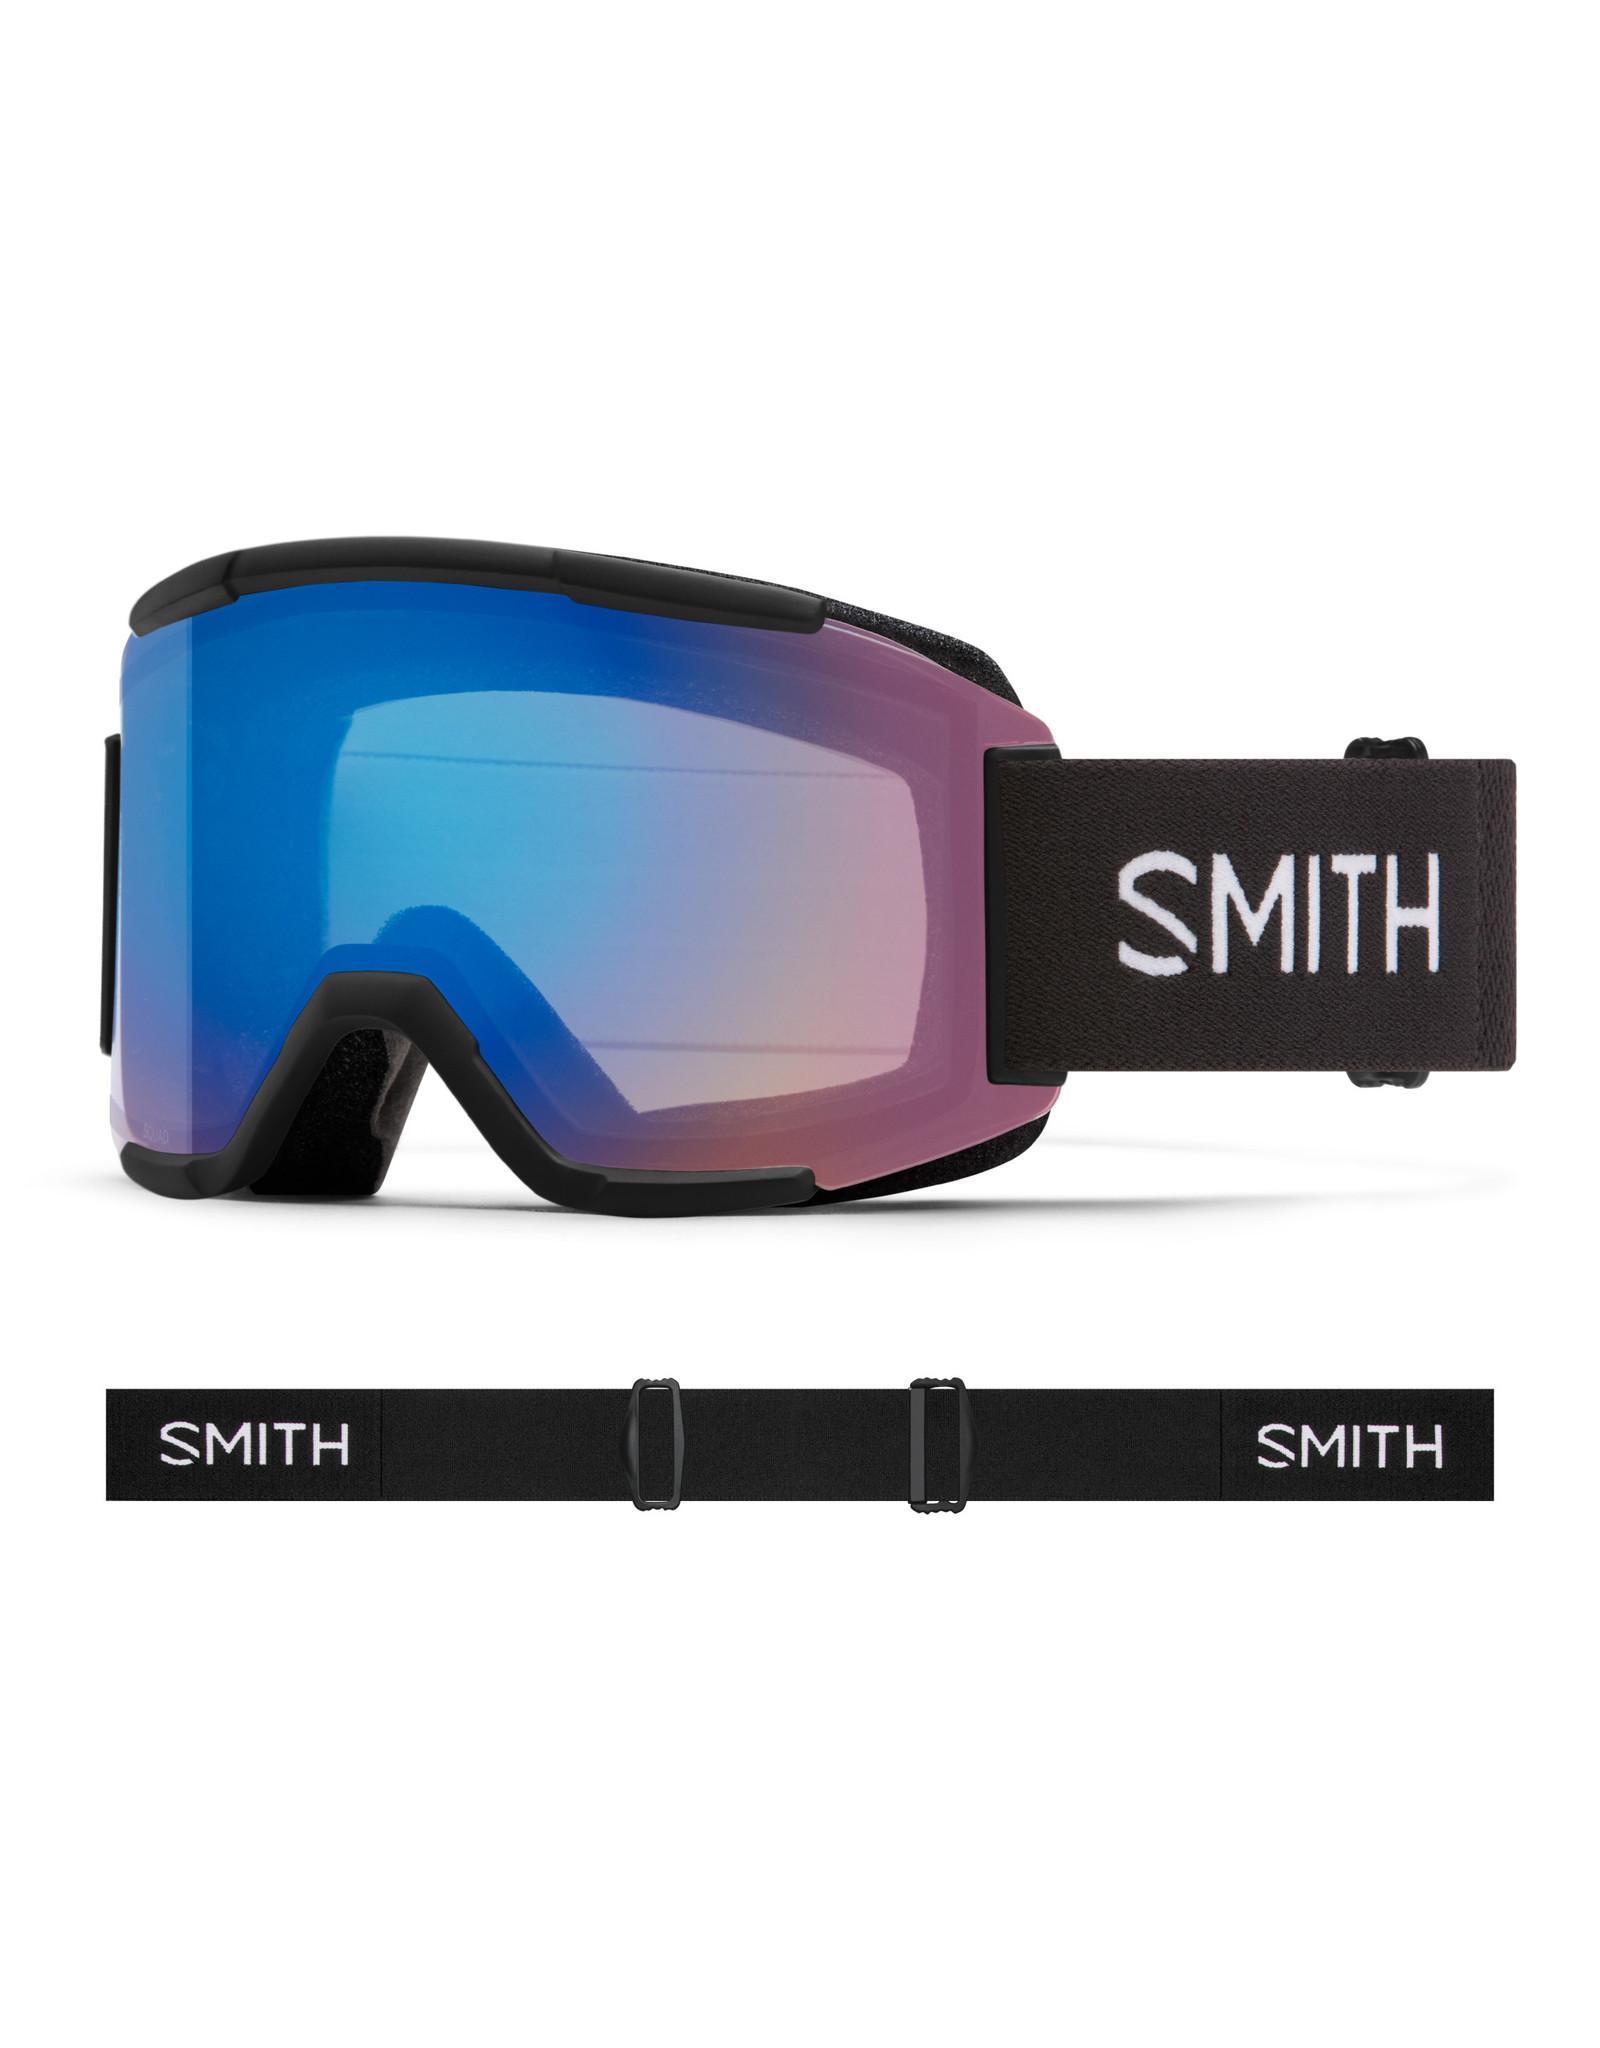 Smith SMITH SQUAD BLACK 20 LUNETTES DE SKI